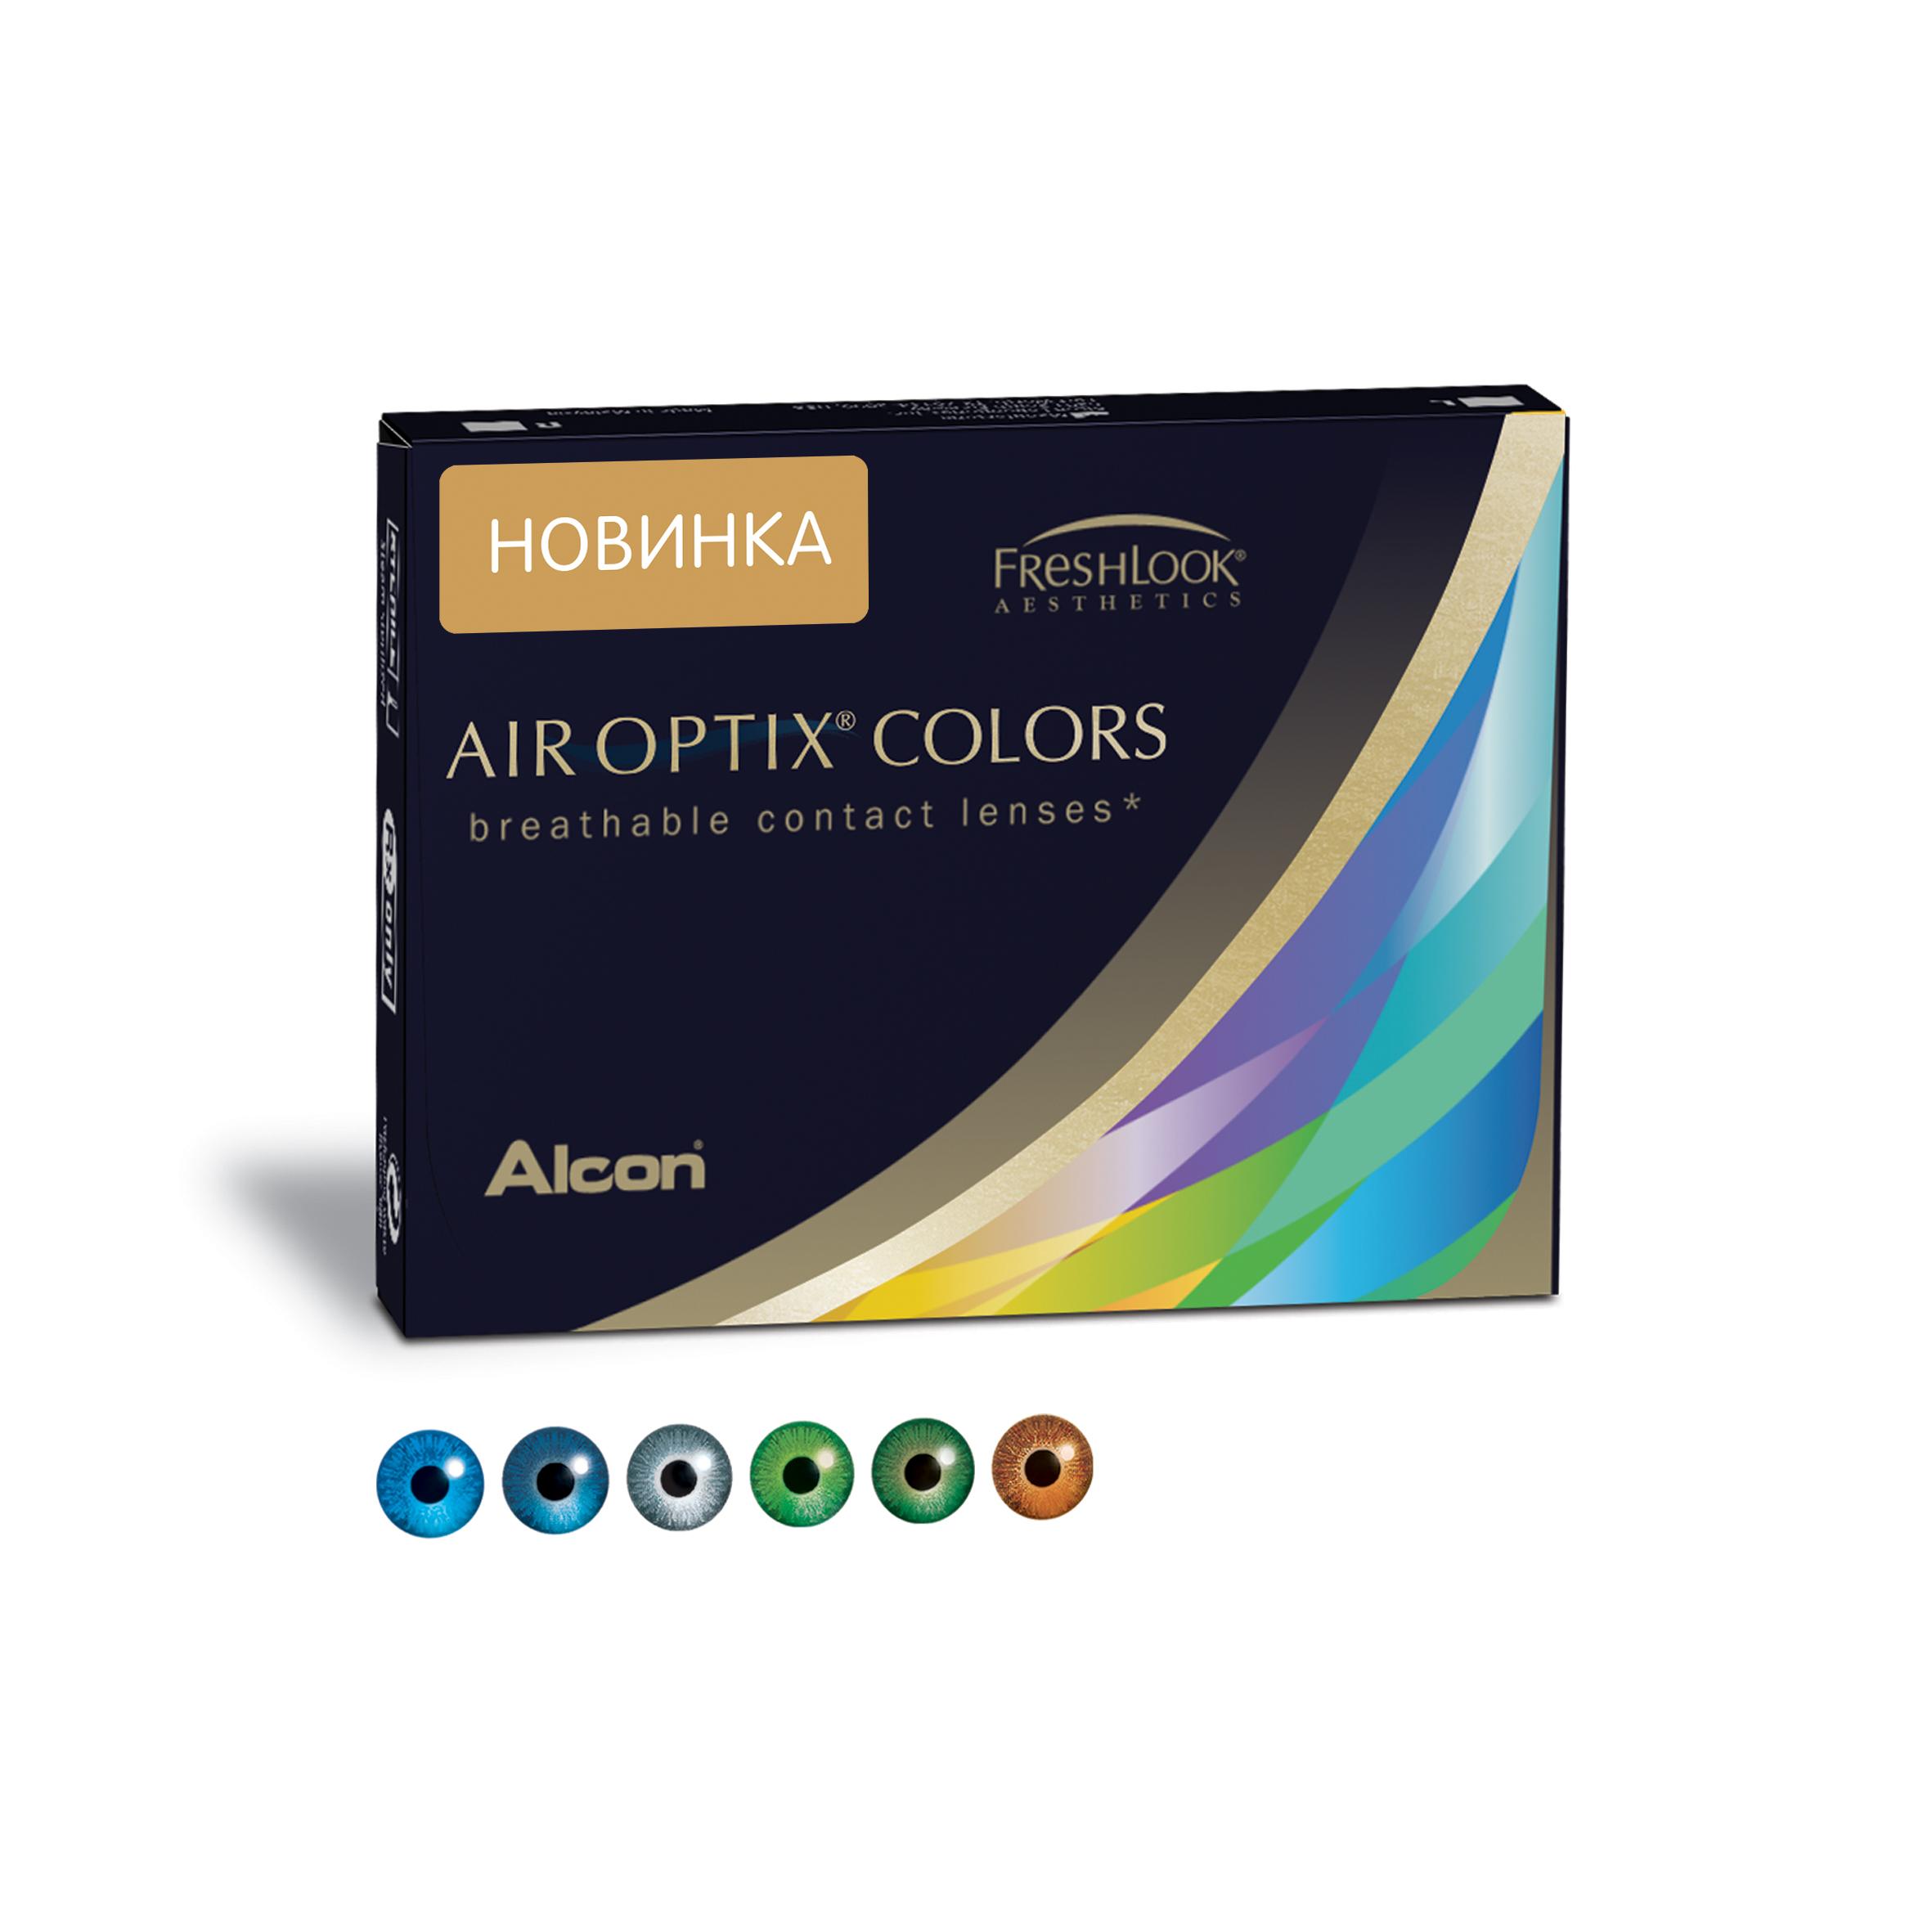 Аlcon контактные линзы Air Optix Colors 2 шт -3.50 Gemstone Green31746214Мягкие контактные линзы